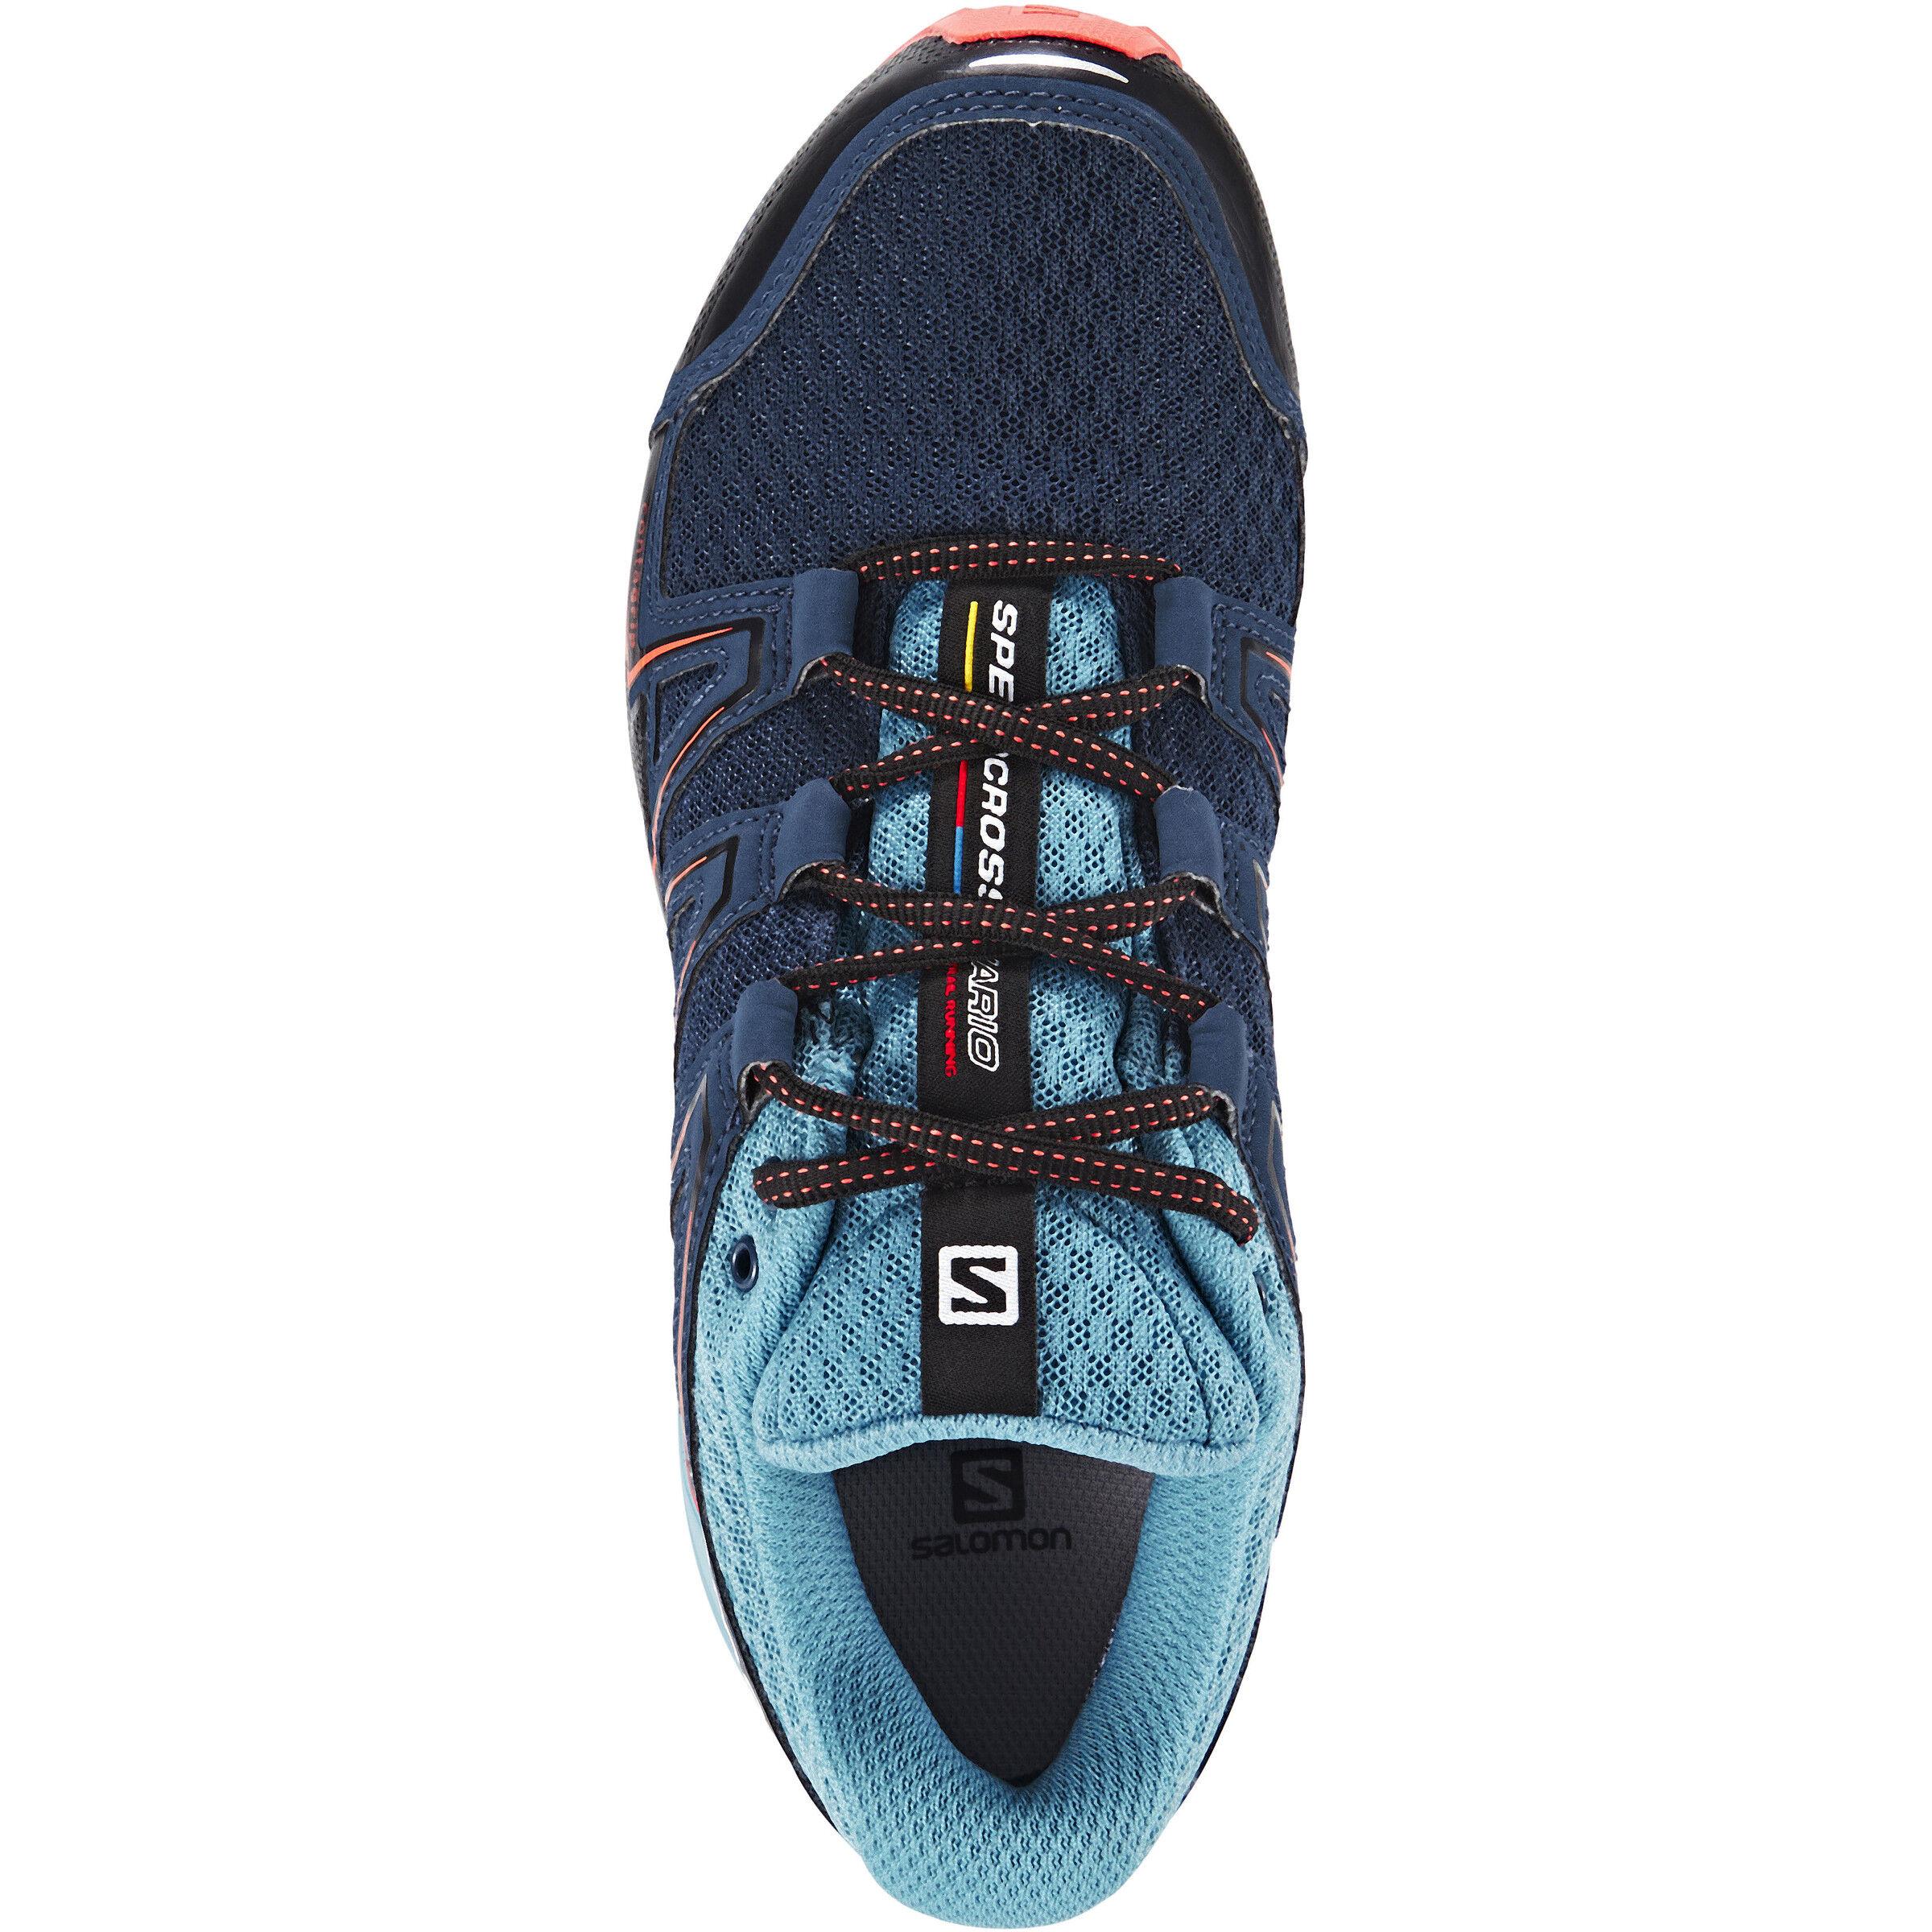 Salomon Speedcross Vario GTX Trailrunning Shoes Damen slateblueblue gumcoral punch